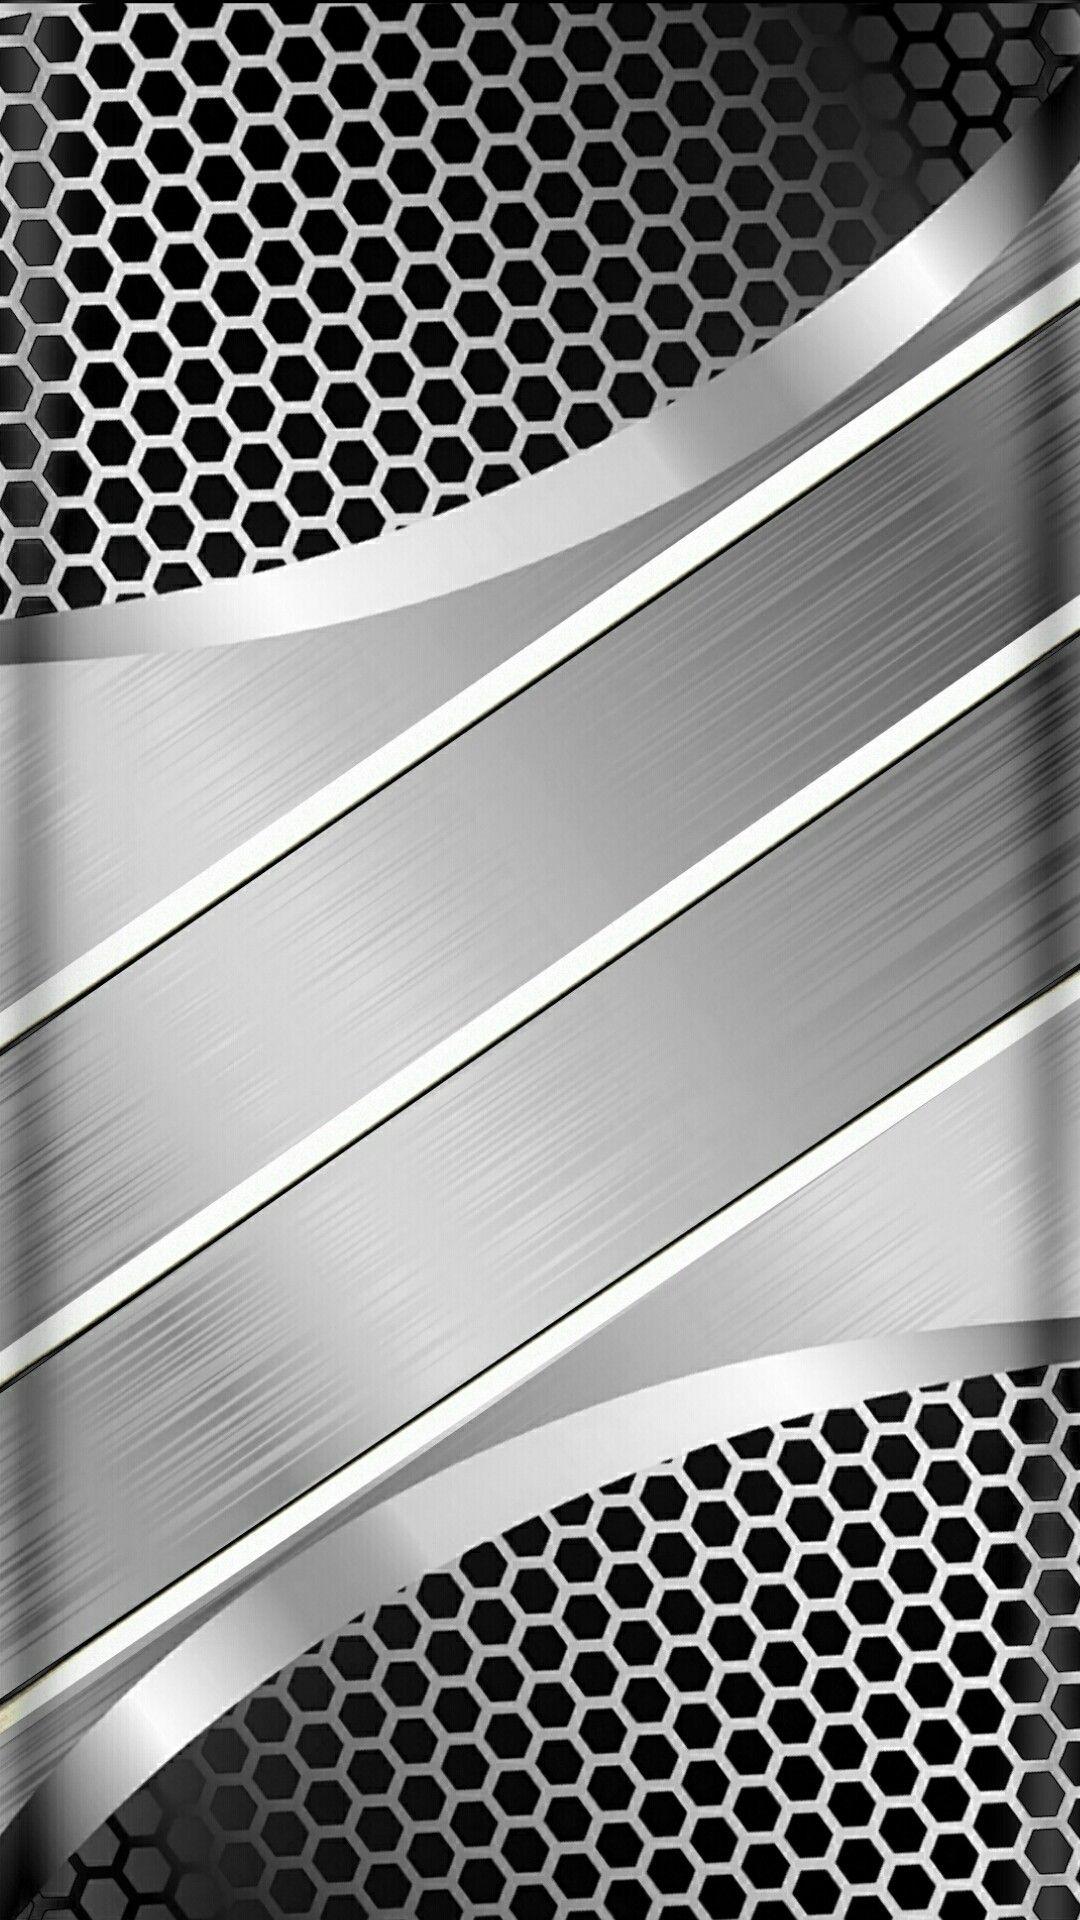 Pin By Slavomir Balog On Tapety Phone Wallpaper Patterns Silver Grey Wallpaper Black Wallpaper